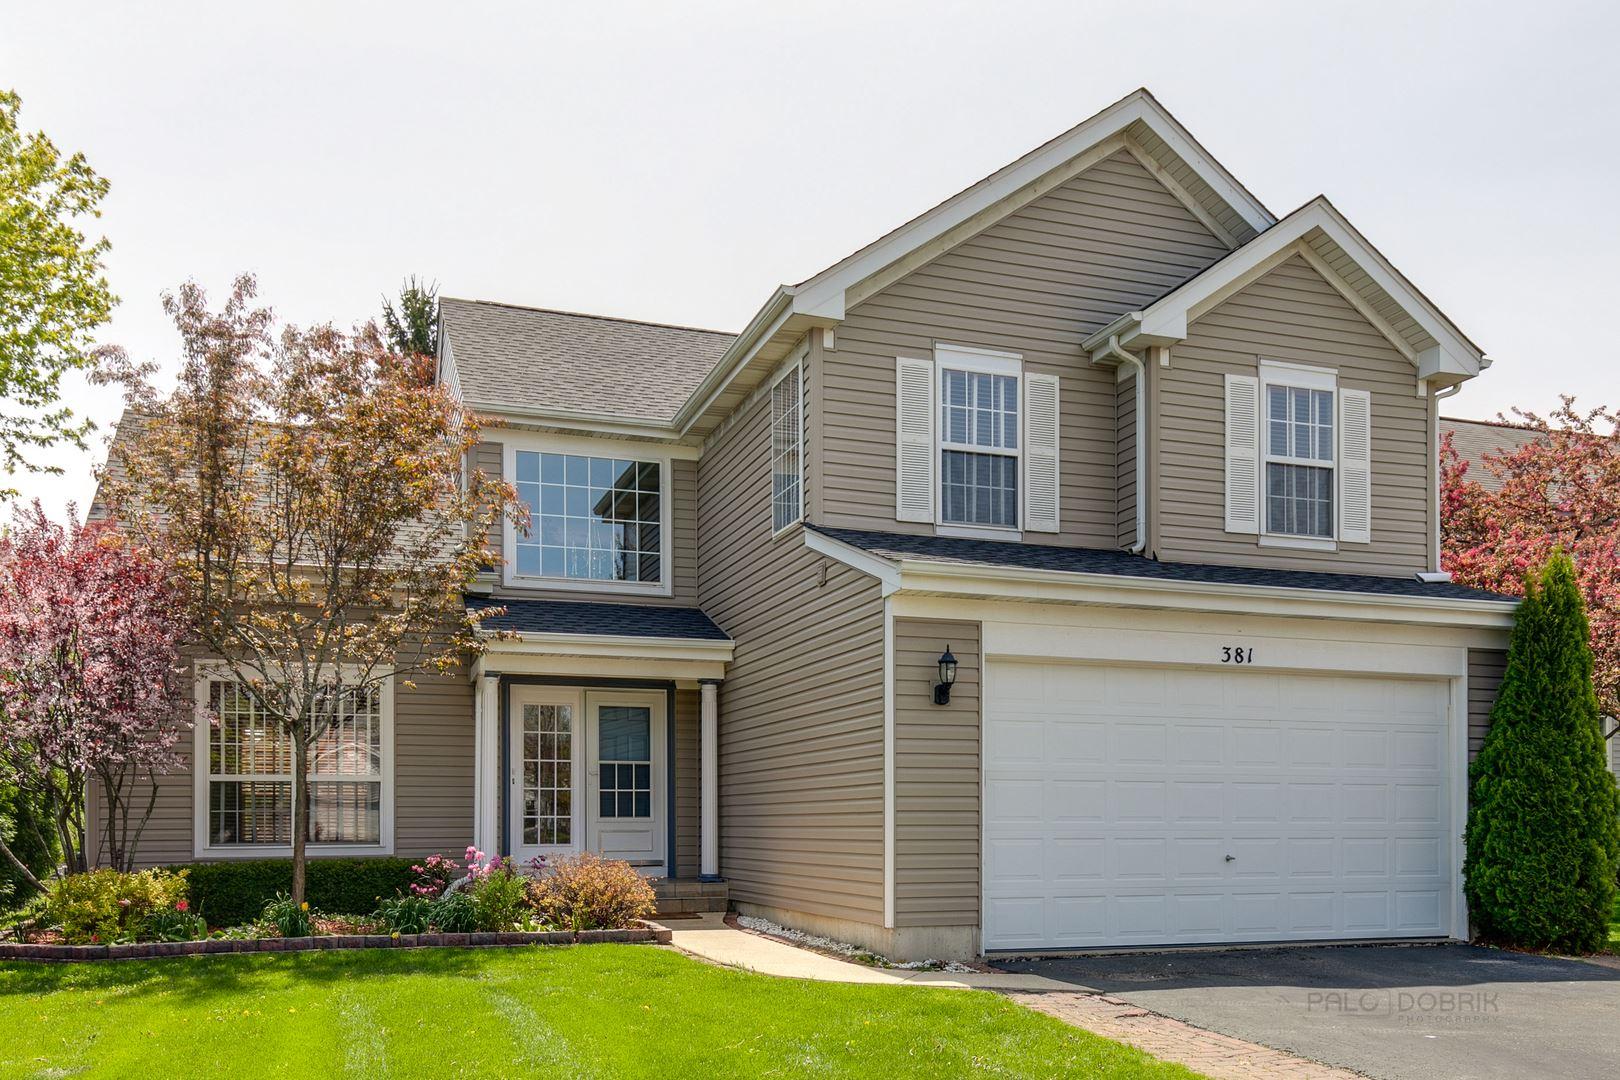 381 W Boxwood Court, Round Lake, IL 60073 - #: 10665593